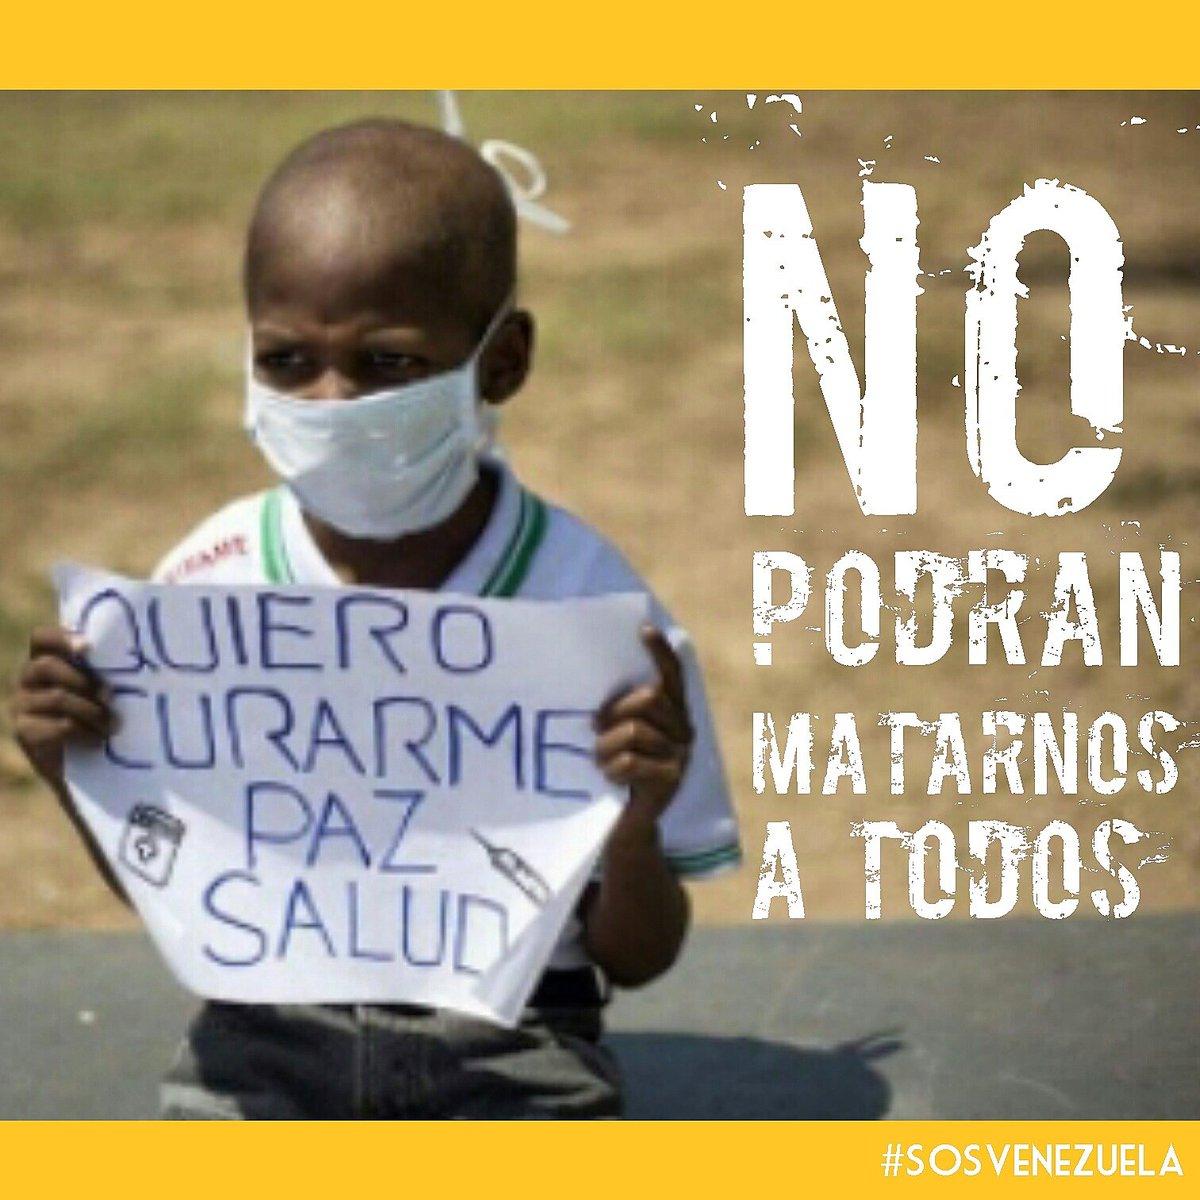 #NoPodranMatarnosATodos!  ¡La peor derrota es la derrota del corazón! https://t.co/AV0LGKGQWo #SOSVenezuela https://t.co/j7y803jAa6